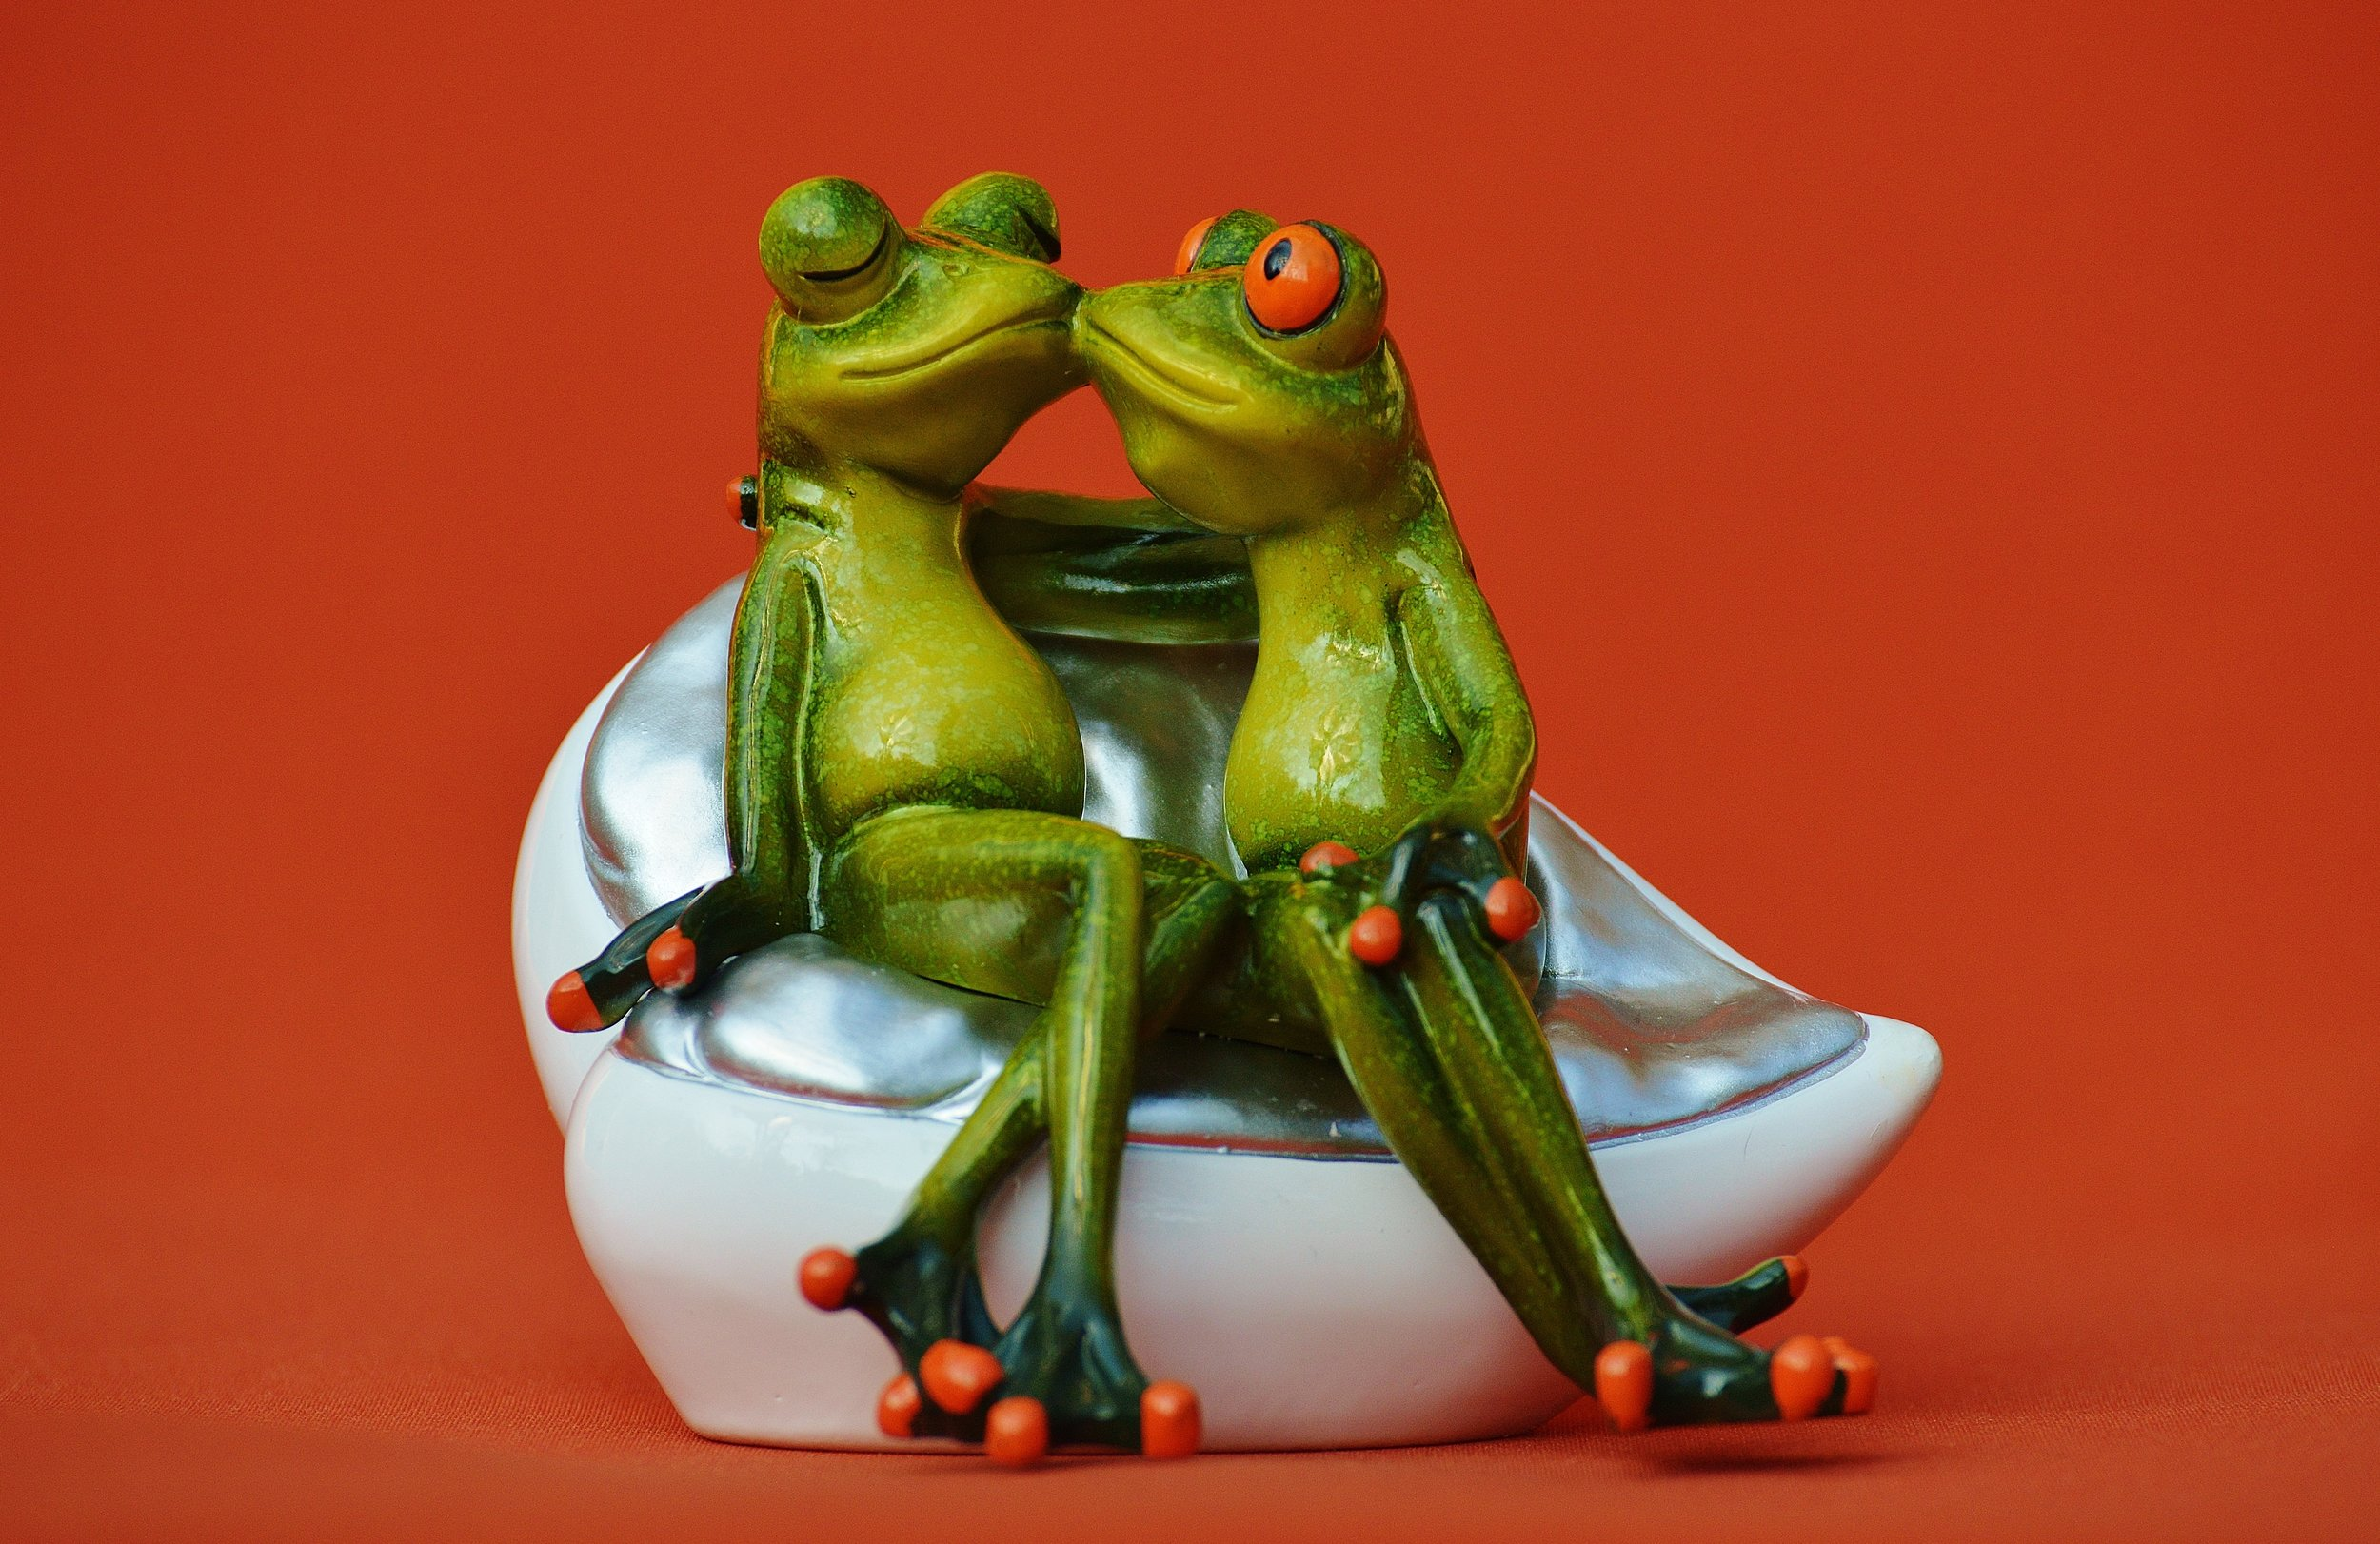 cute-love-green-kiss-couple-romance-816058-pxhere.com.jpg